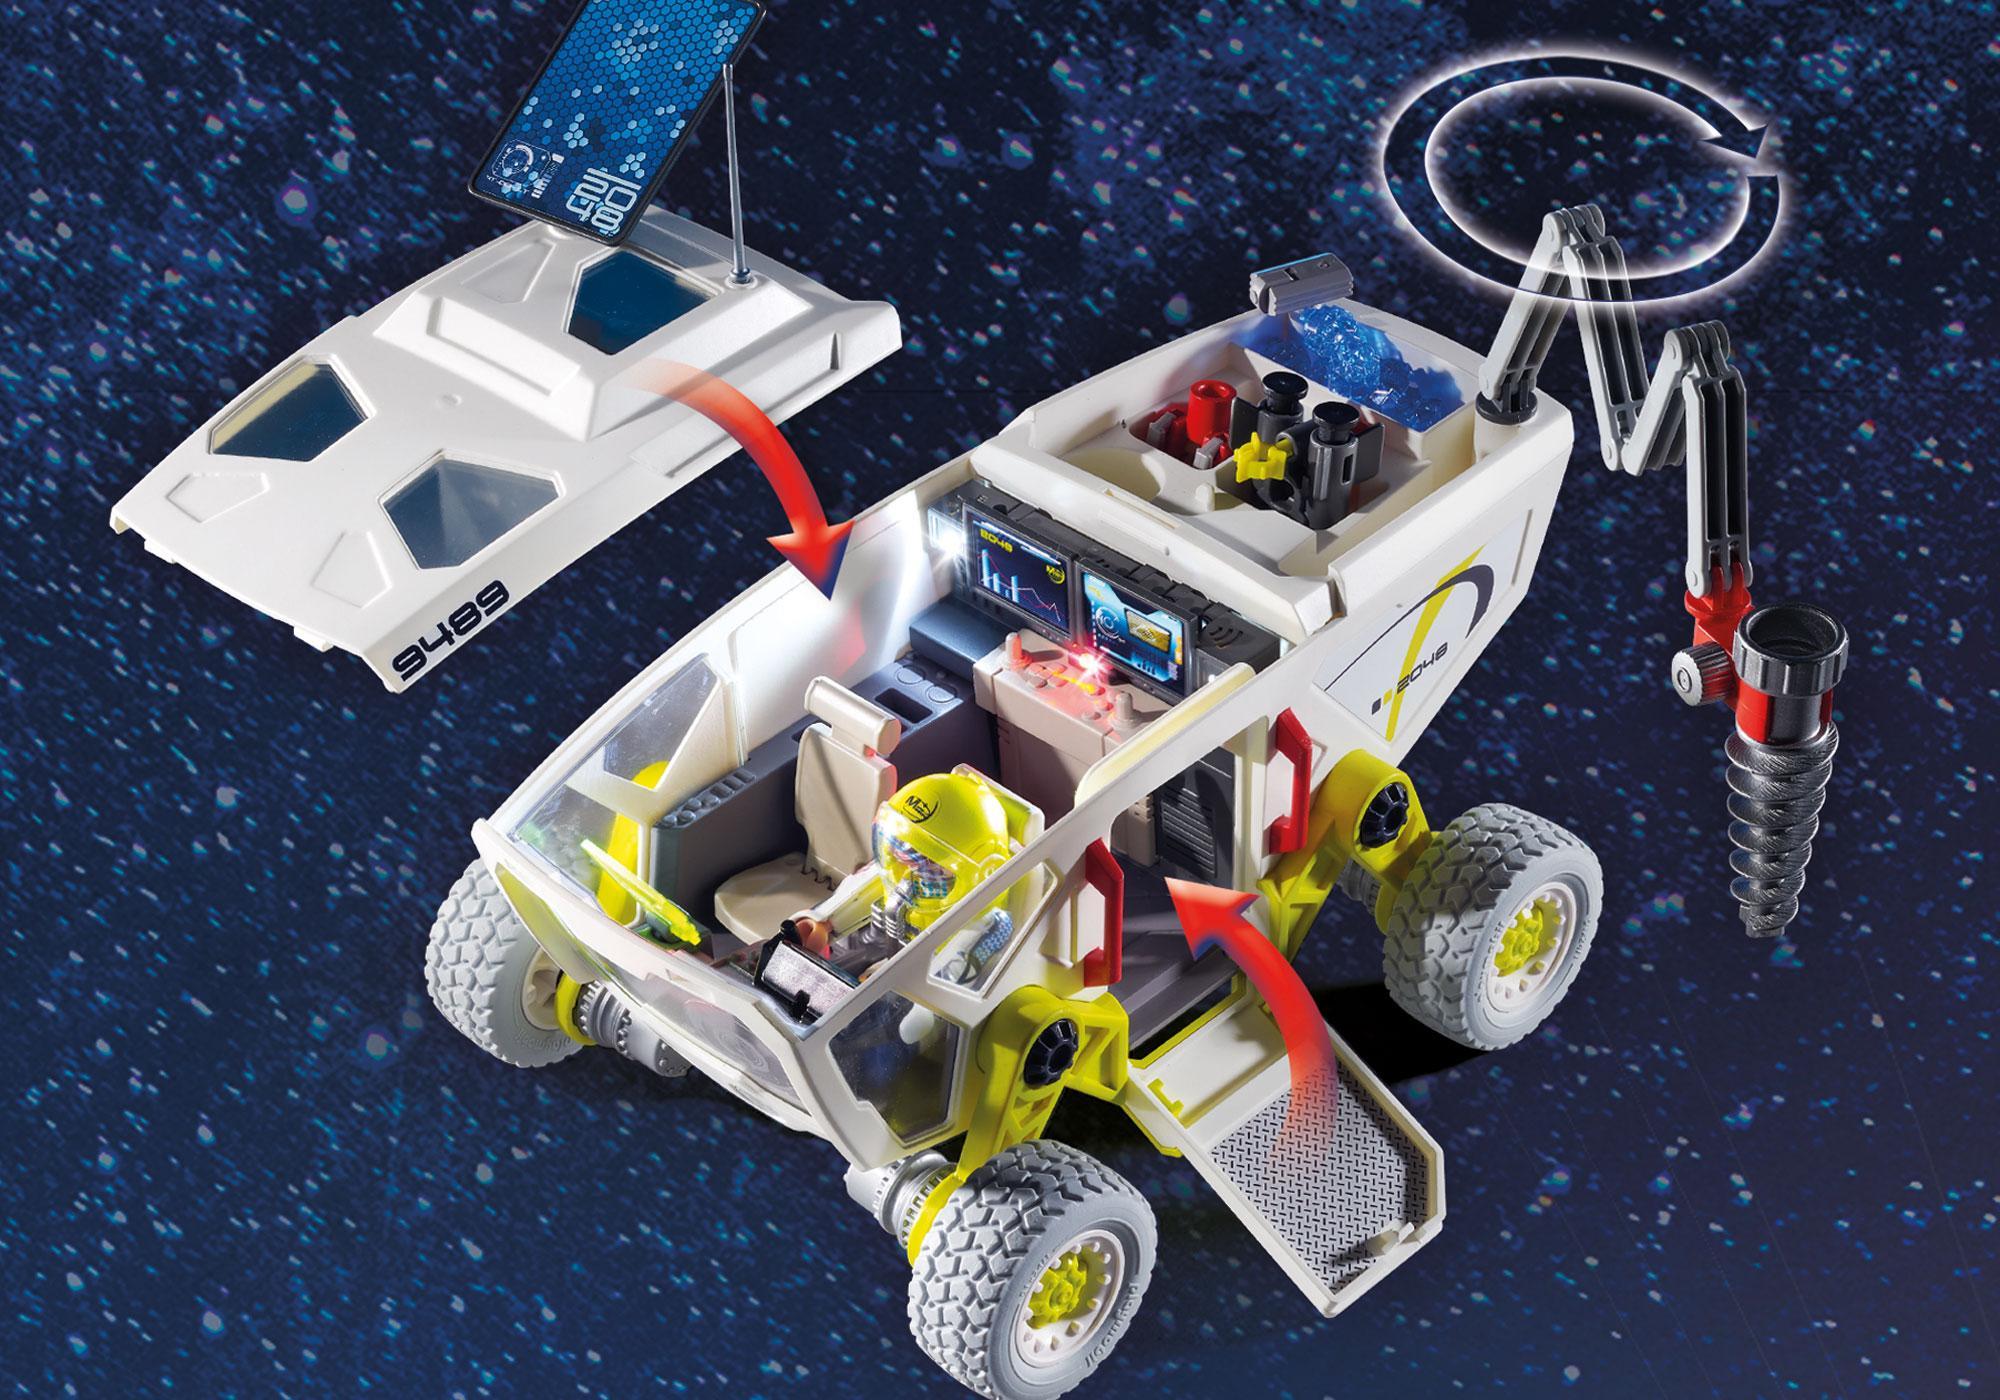 http://media.playmobil.com/i/playmobil/9489_product_extra3/Διαστημικό όχημα εξερεύνησης